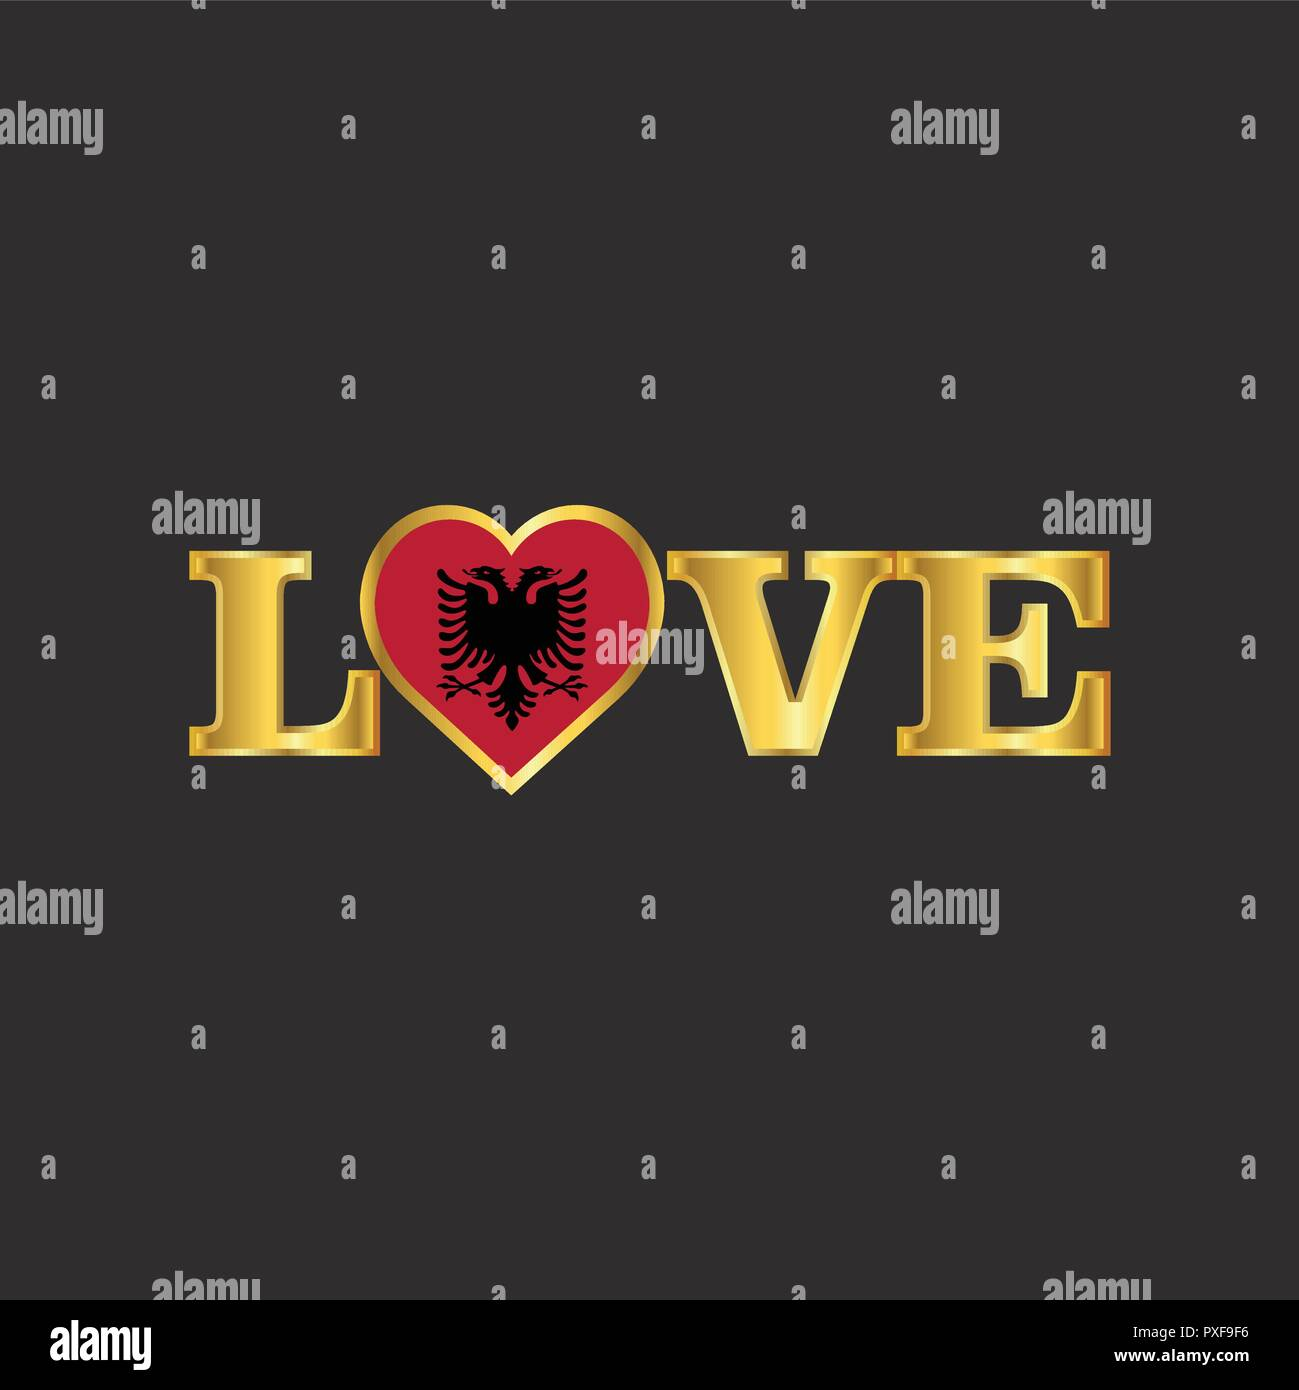 Golden Love typography Albania flag design vector - Stock Vector